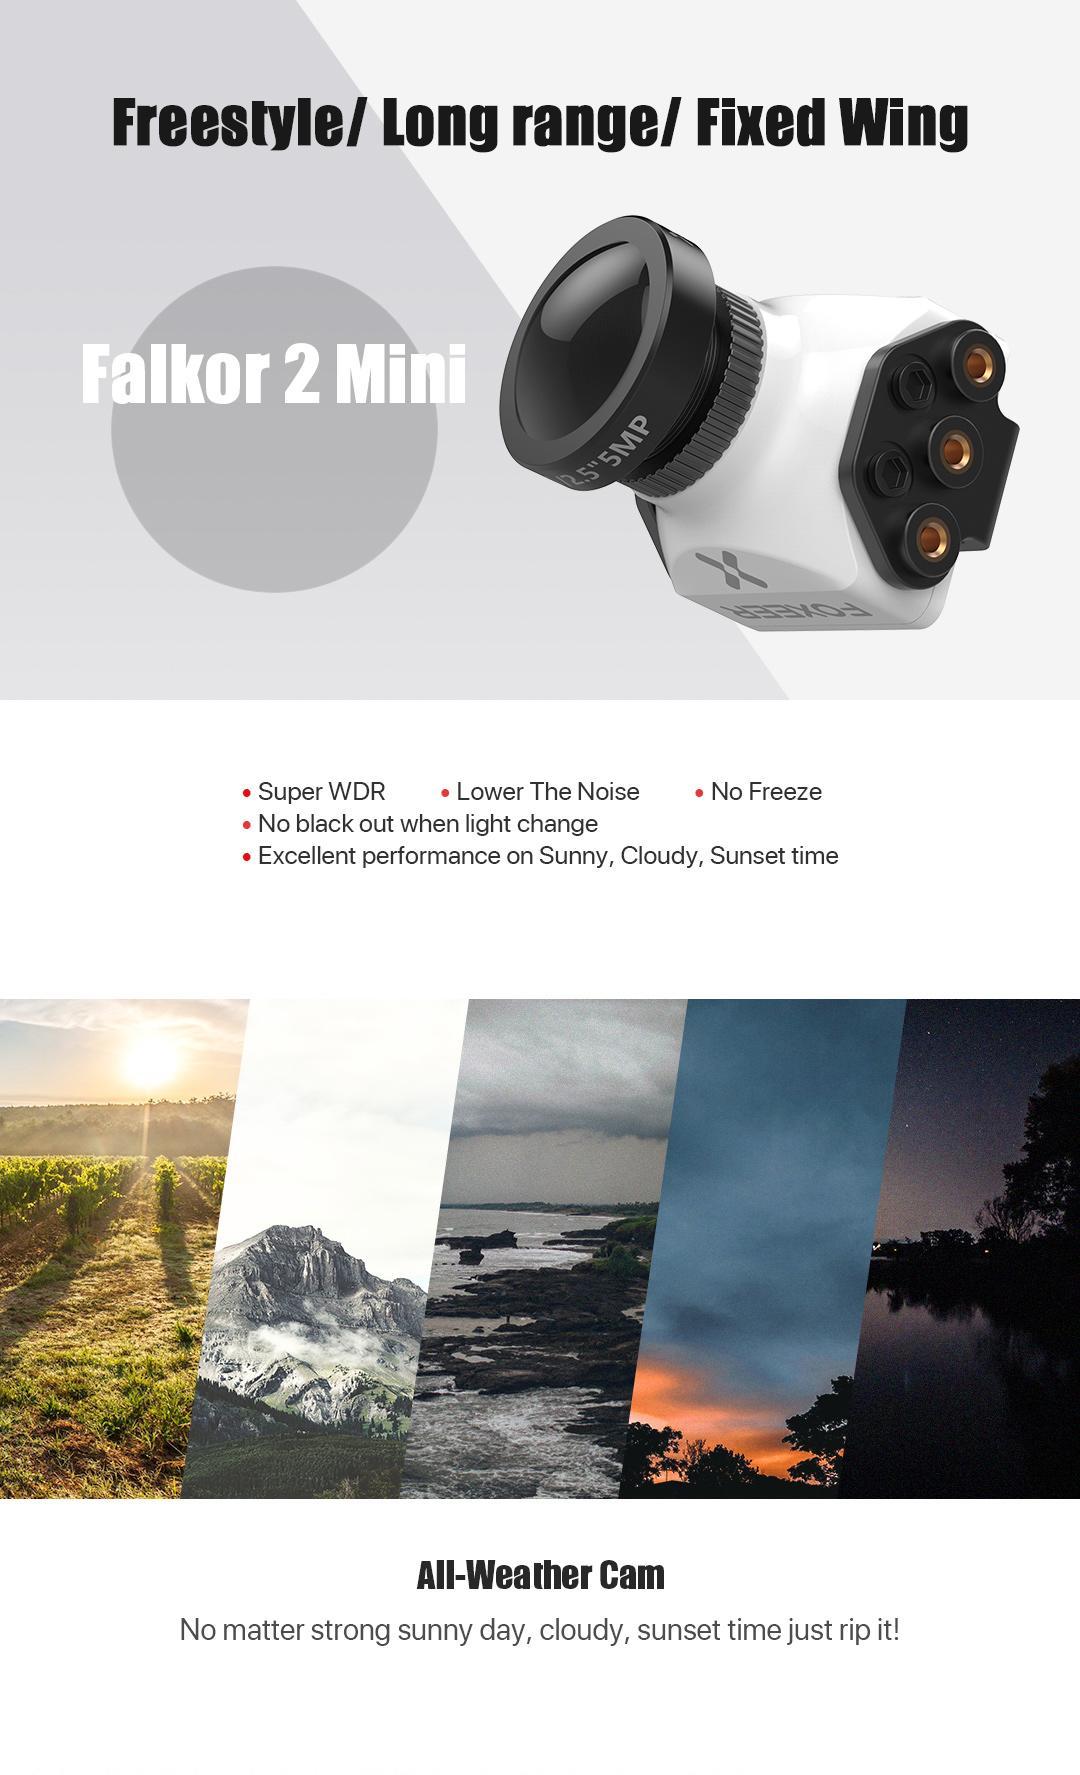 Falkor 2 mini fpv camera